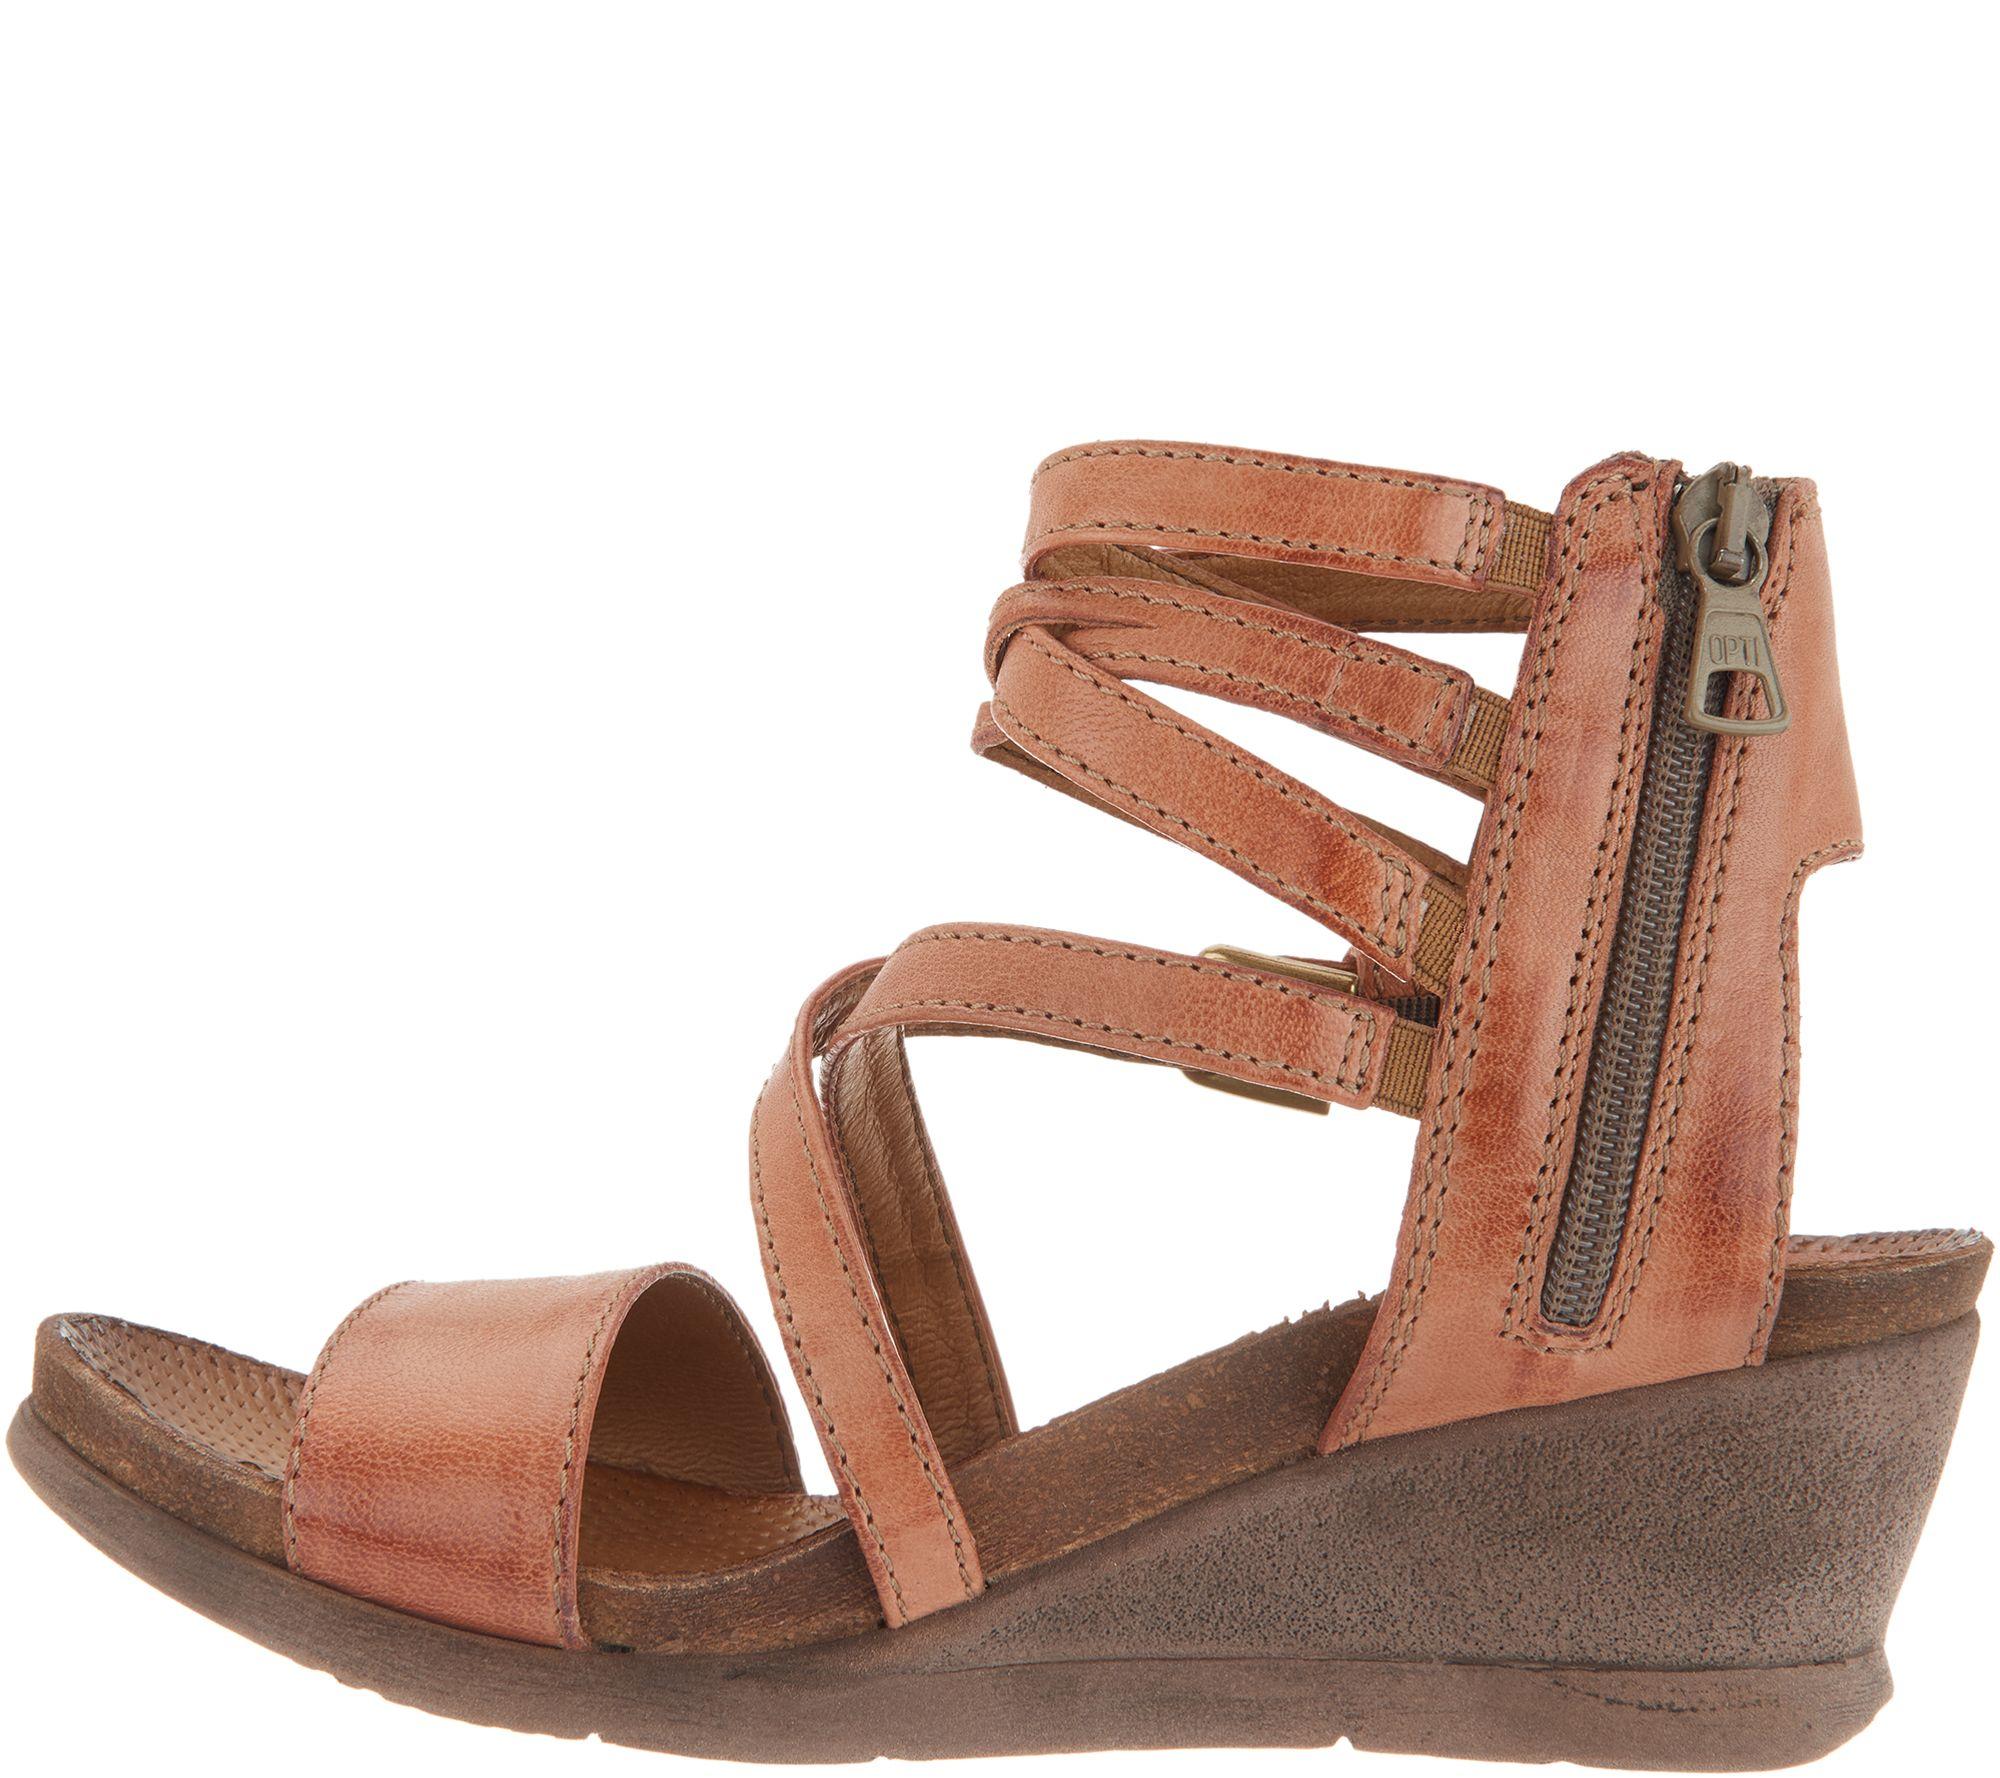 Miz Mooz Leather Multi Strap Wedge Sandals Shay Page 1